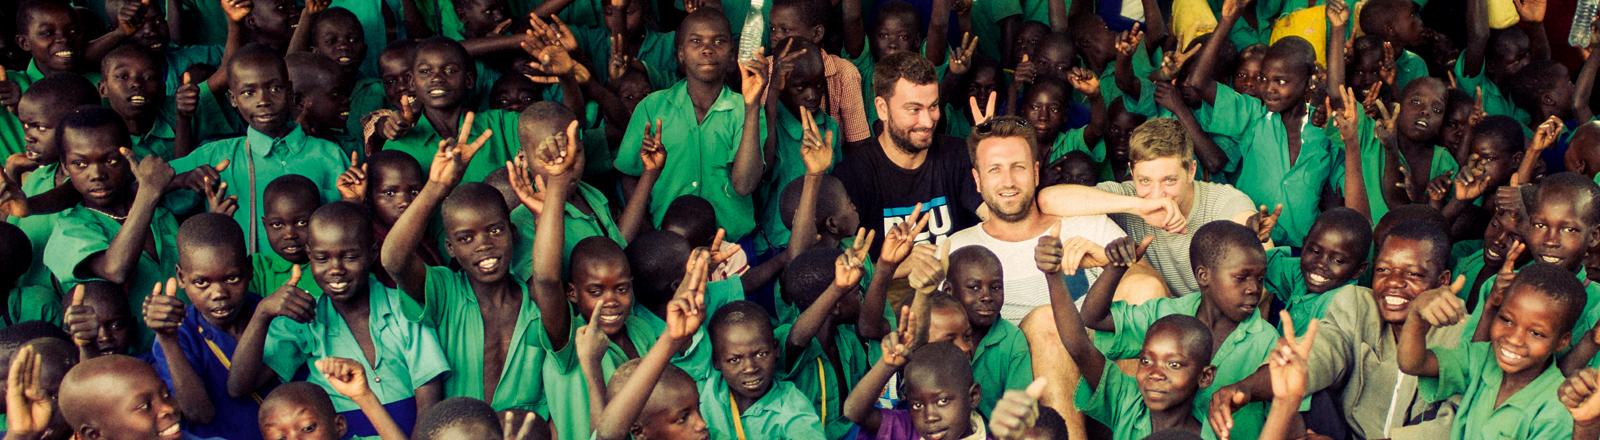 Paul Ripke und Marteria inmitten einer Horde Kinder in Uganda